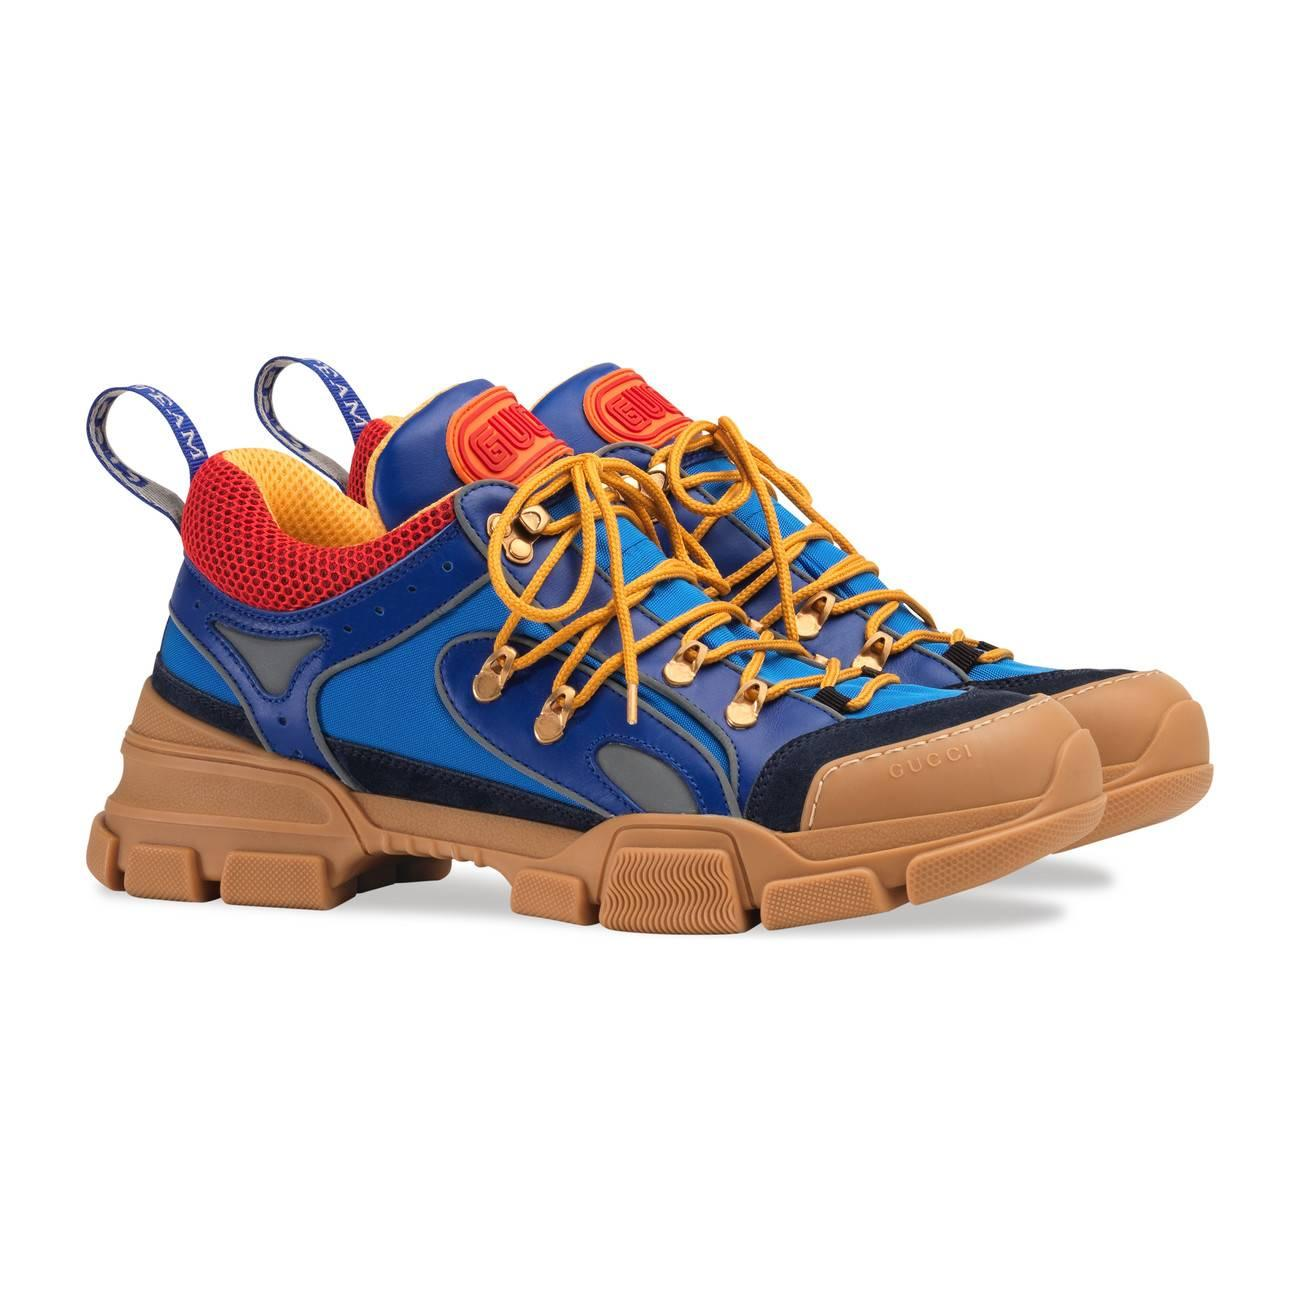 ed170056a24 Gucci - Blue Flashtrek Sneakers for Men - Lyst. View fullscreen